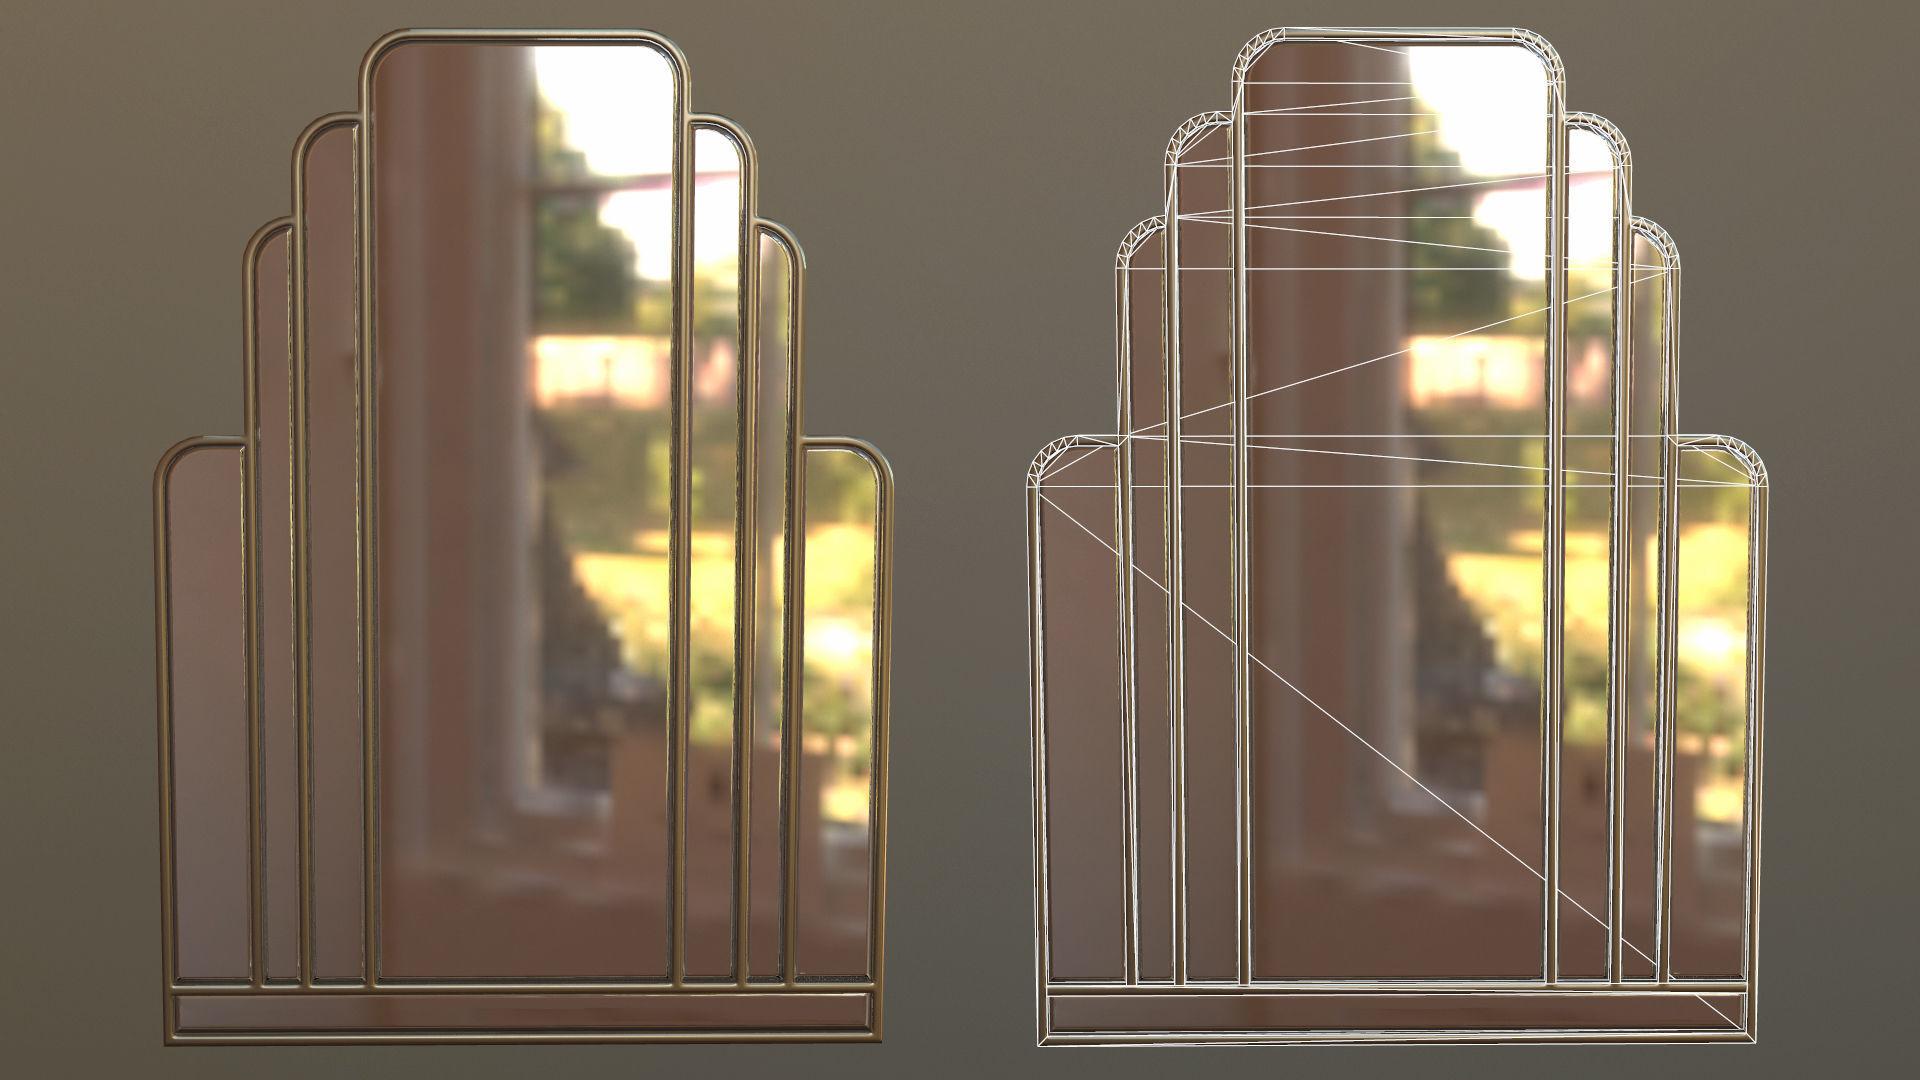 mirror-art-deco-pbr-game-ready-3d-model-low-poly-obj-fbx-ma-mb.jpg , archival pigment print, 2018